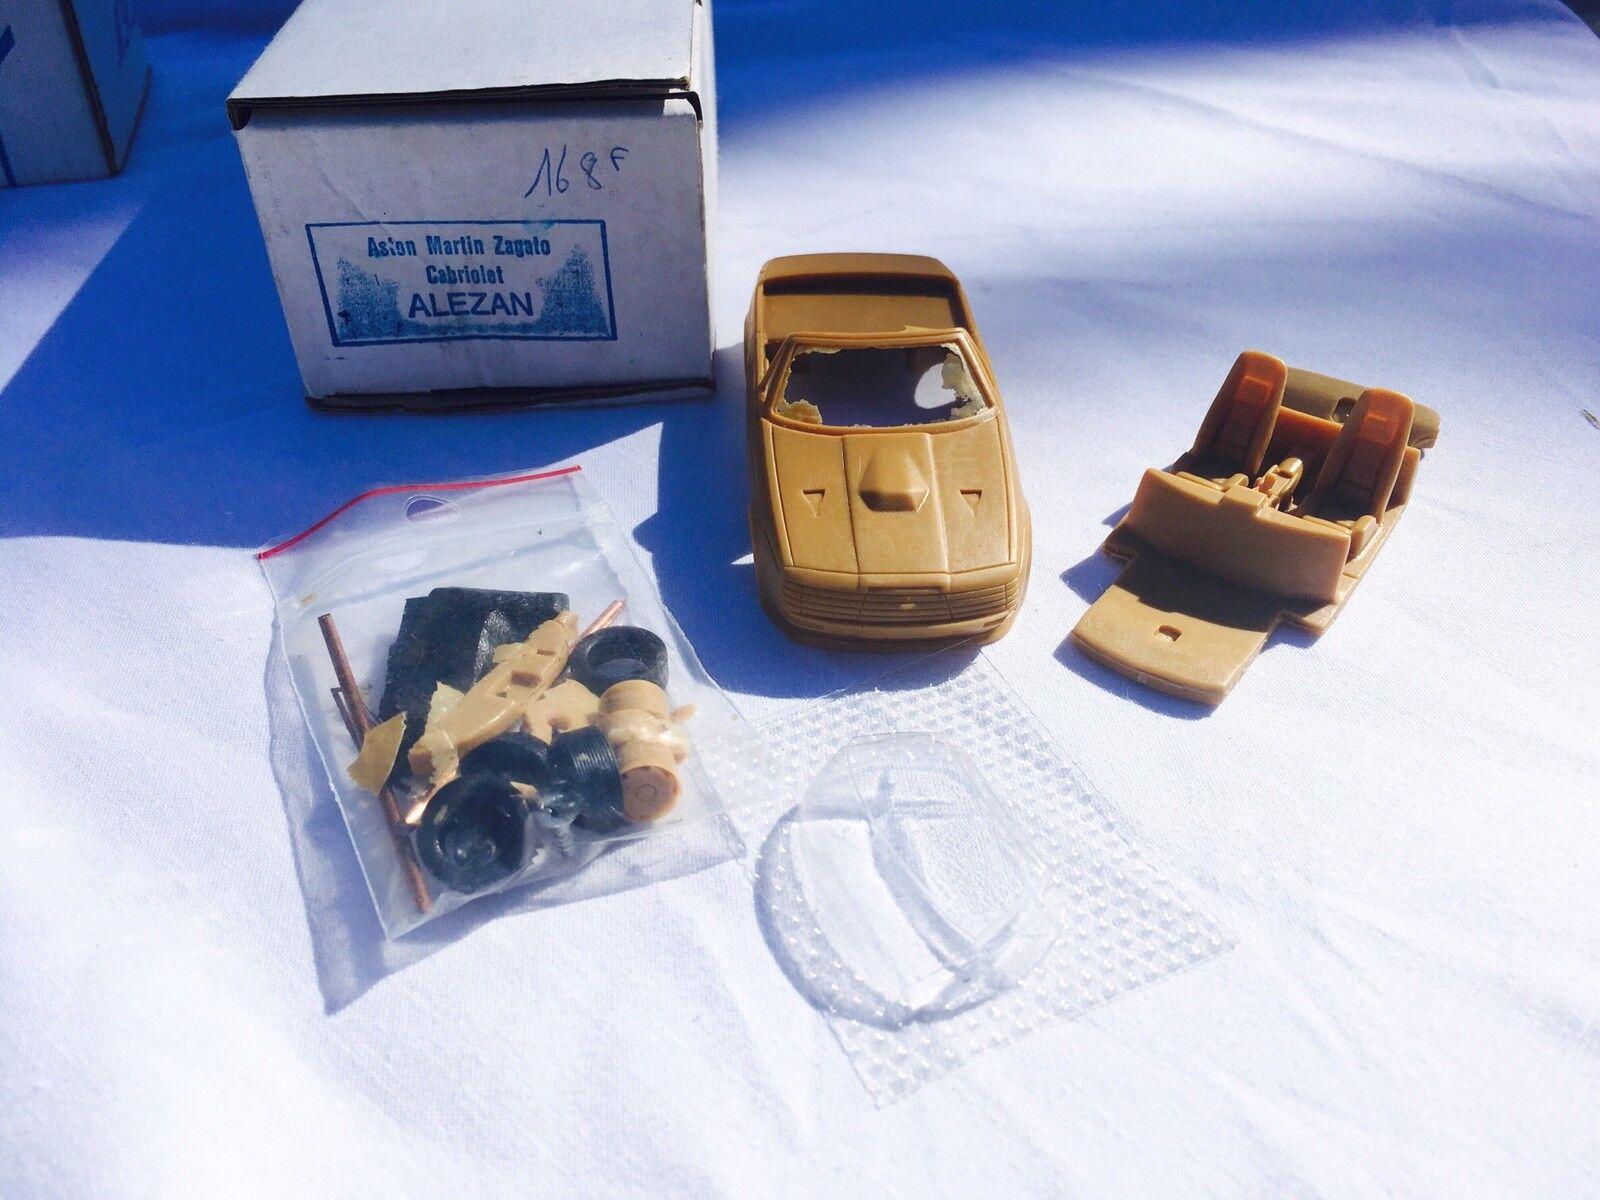 Alezan 1 43 Kit  Maquette  A Monter Aston Martin Zagato